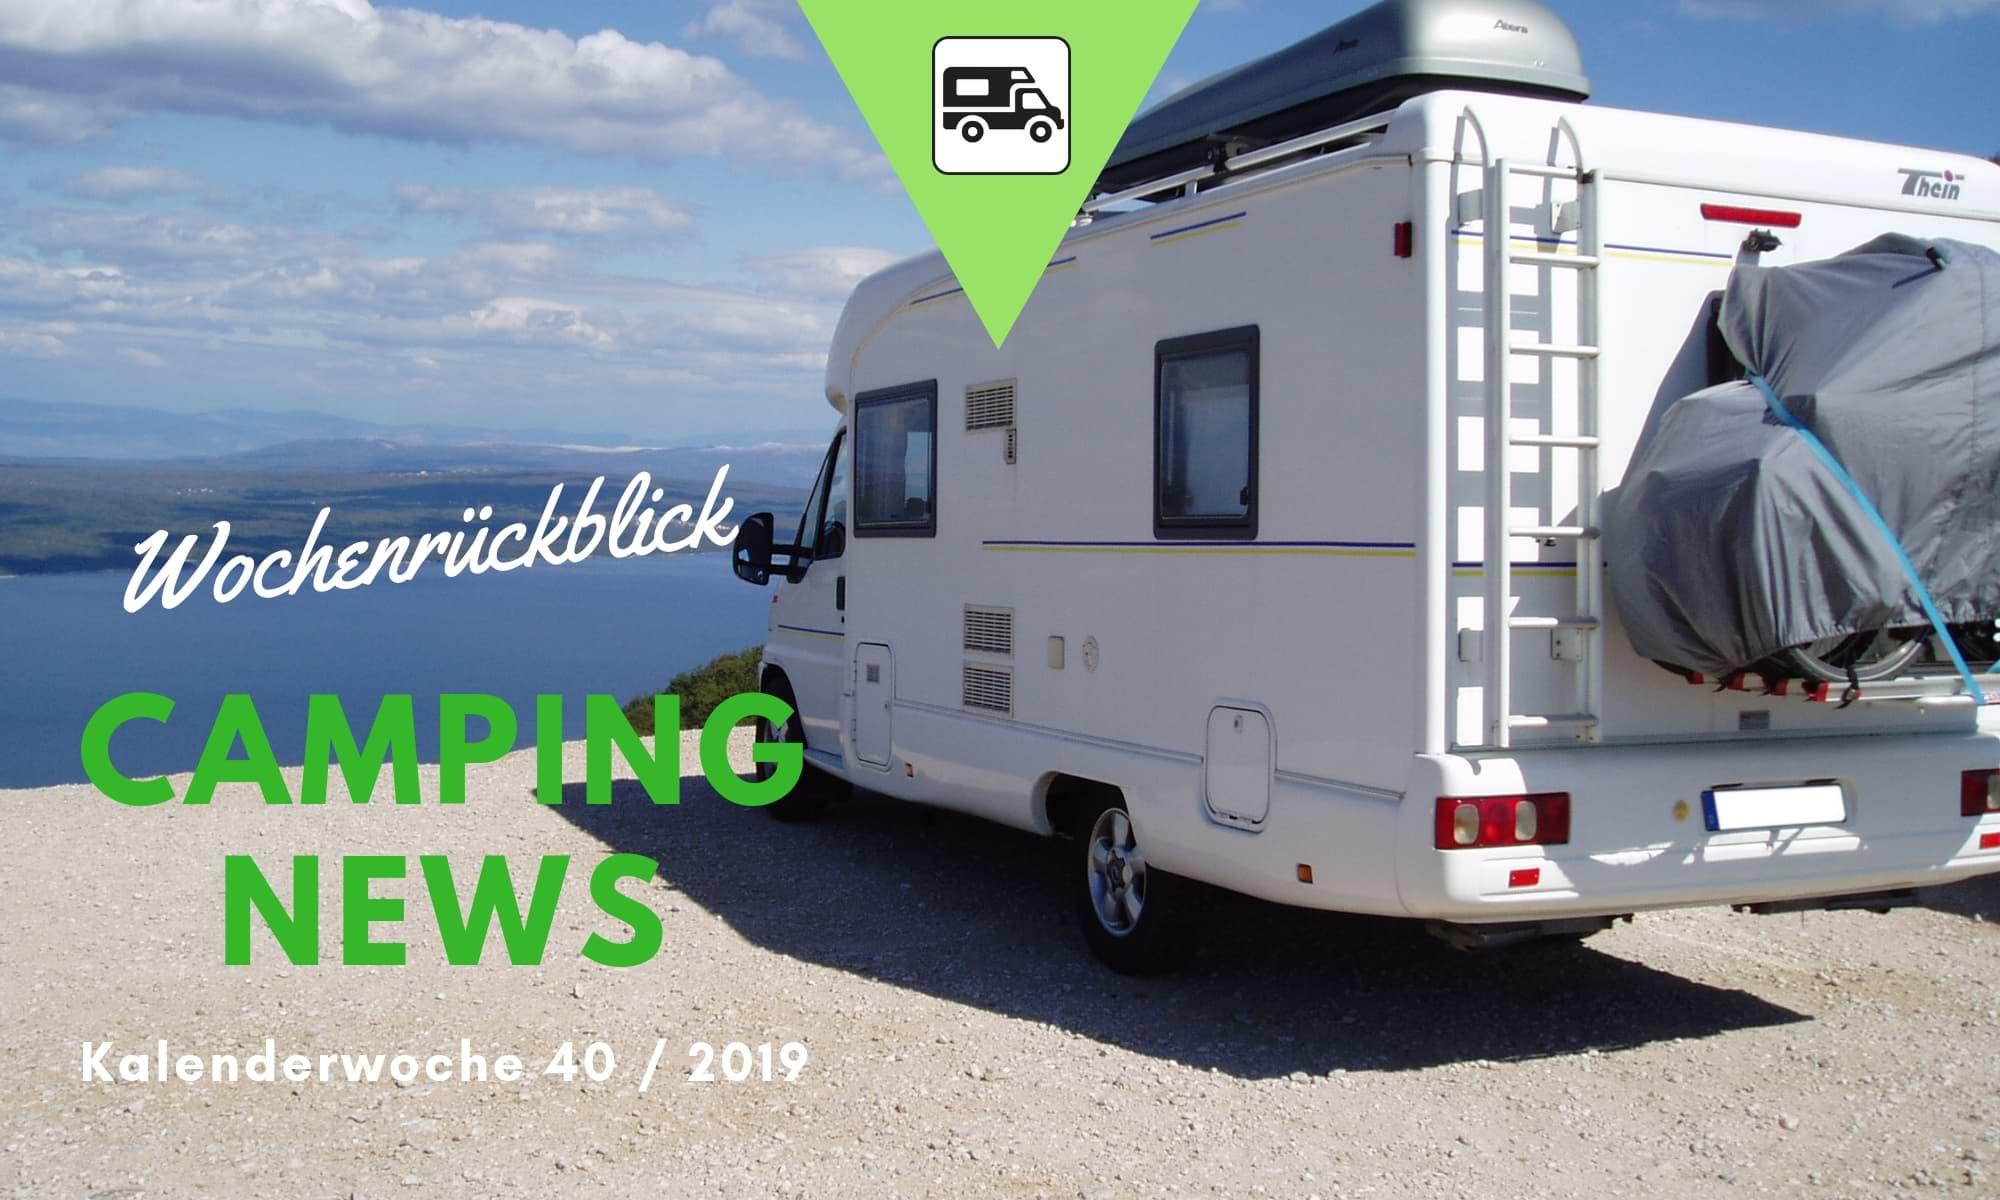 Wochenrückblick Camping News KW40-2019